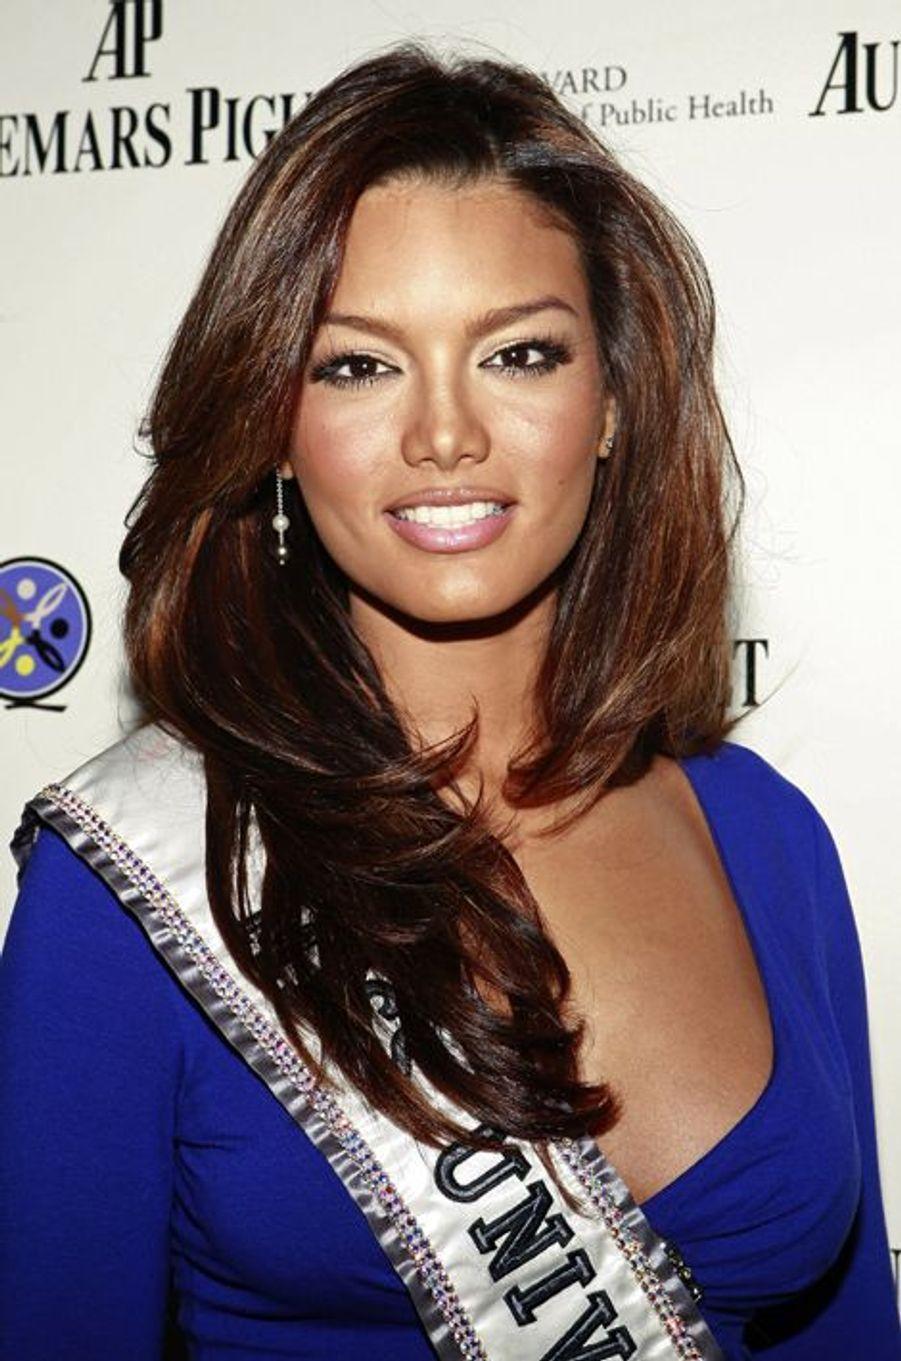 Zuleyka Rivera, Miss Porto Rico élue Miss Univers 2006